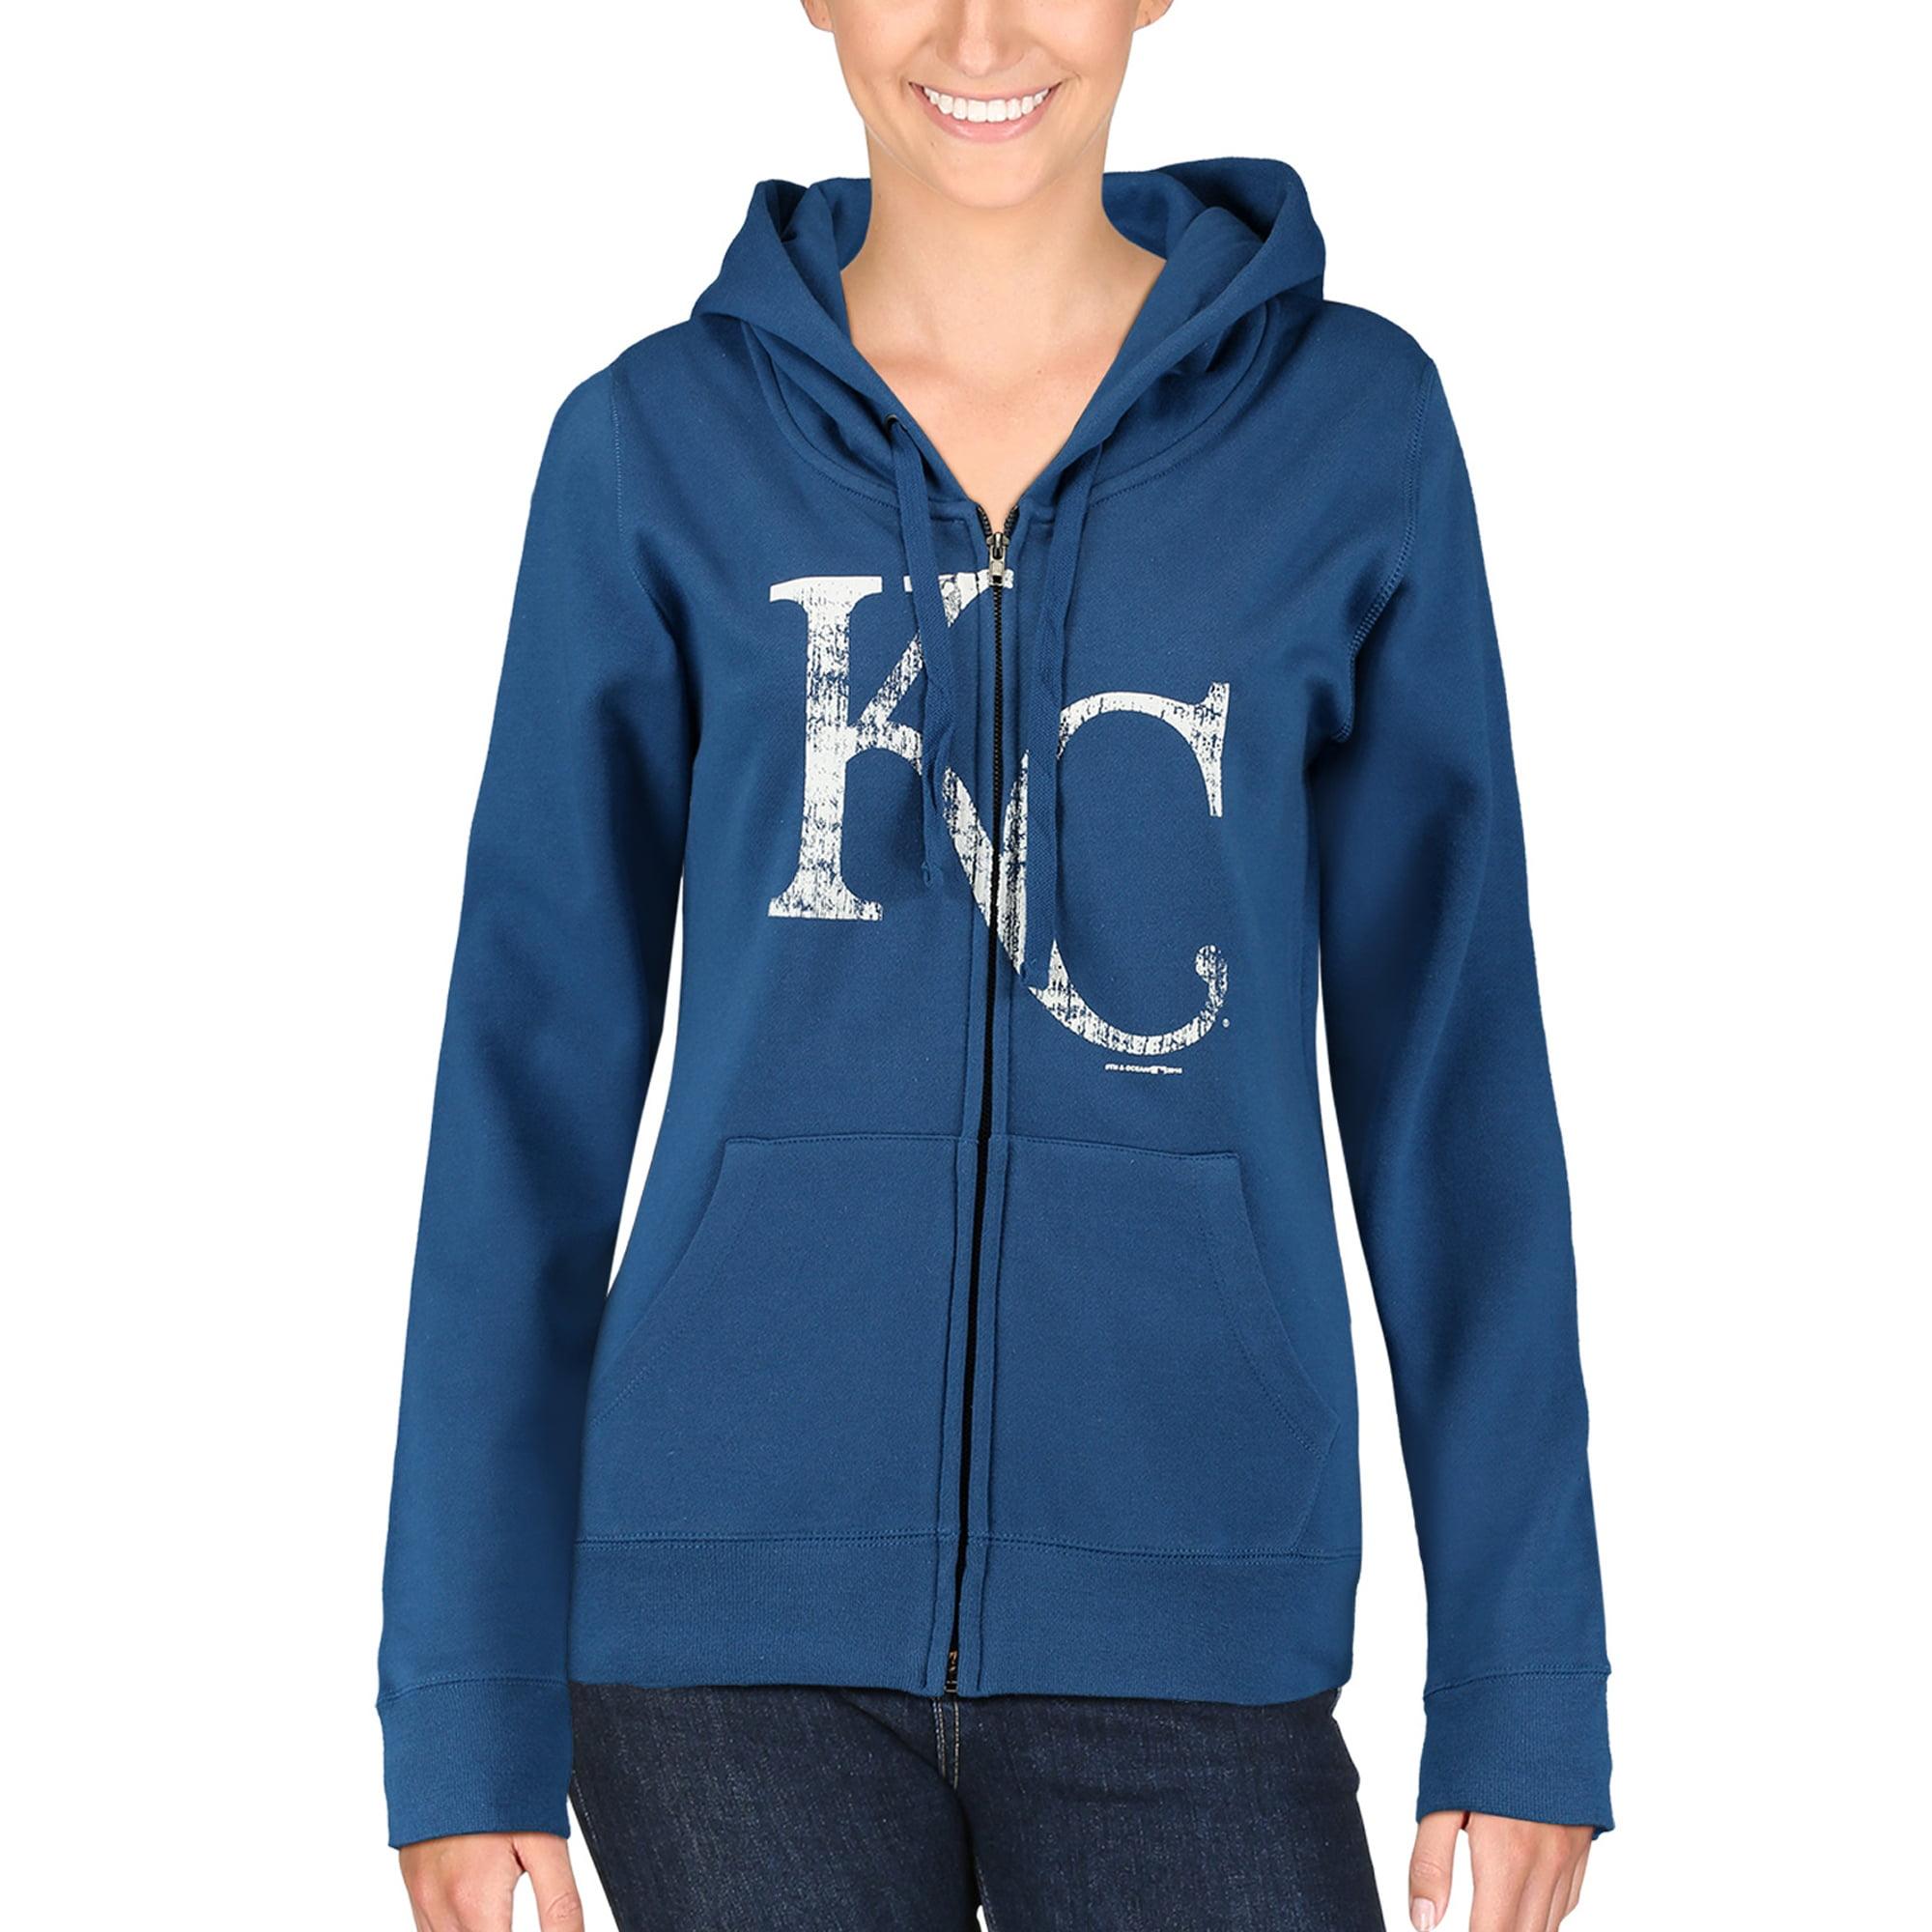 Kansas City Royals 5th & Ocean by New Era Women's Core Fleece Full Zip Hoodie - Royal Blue